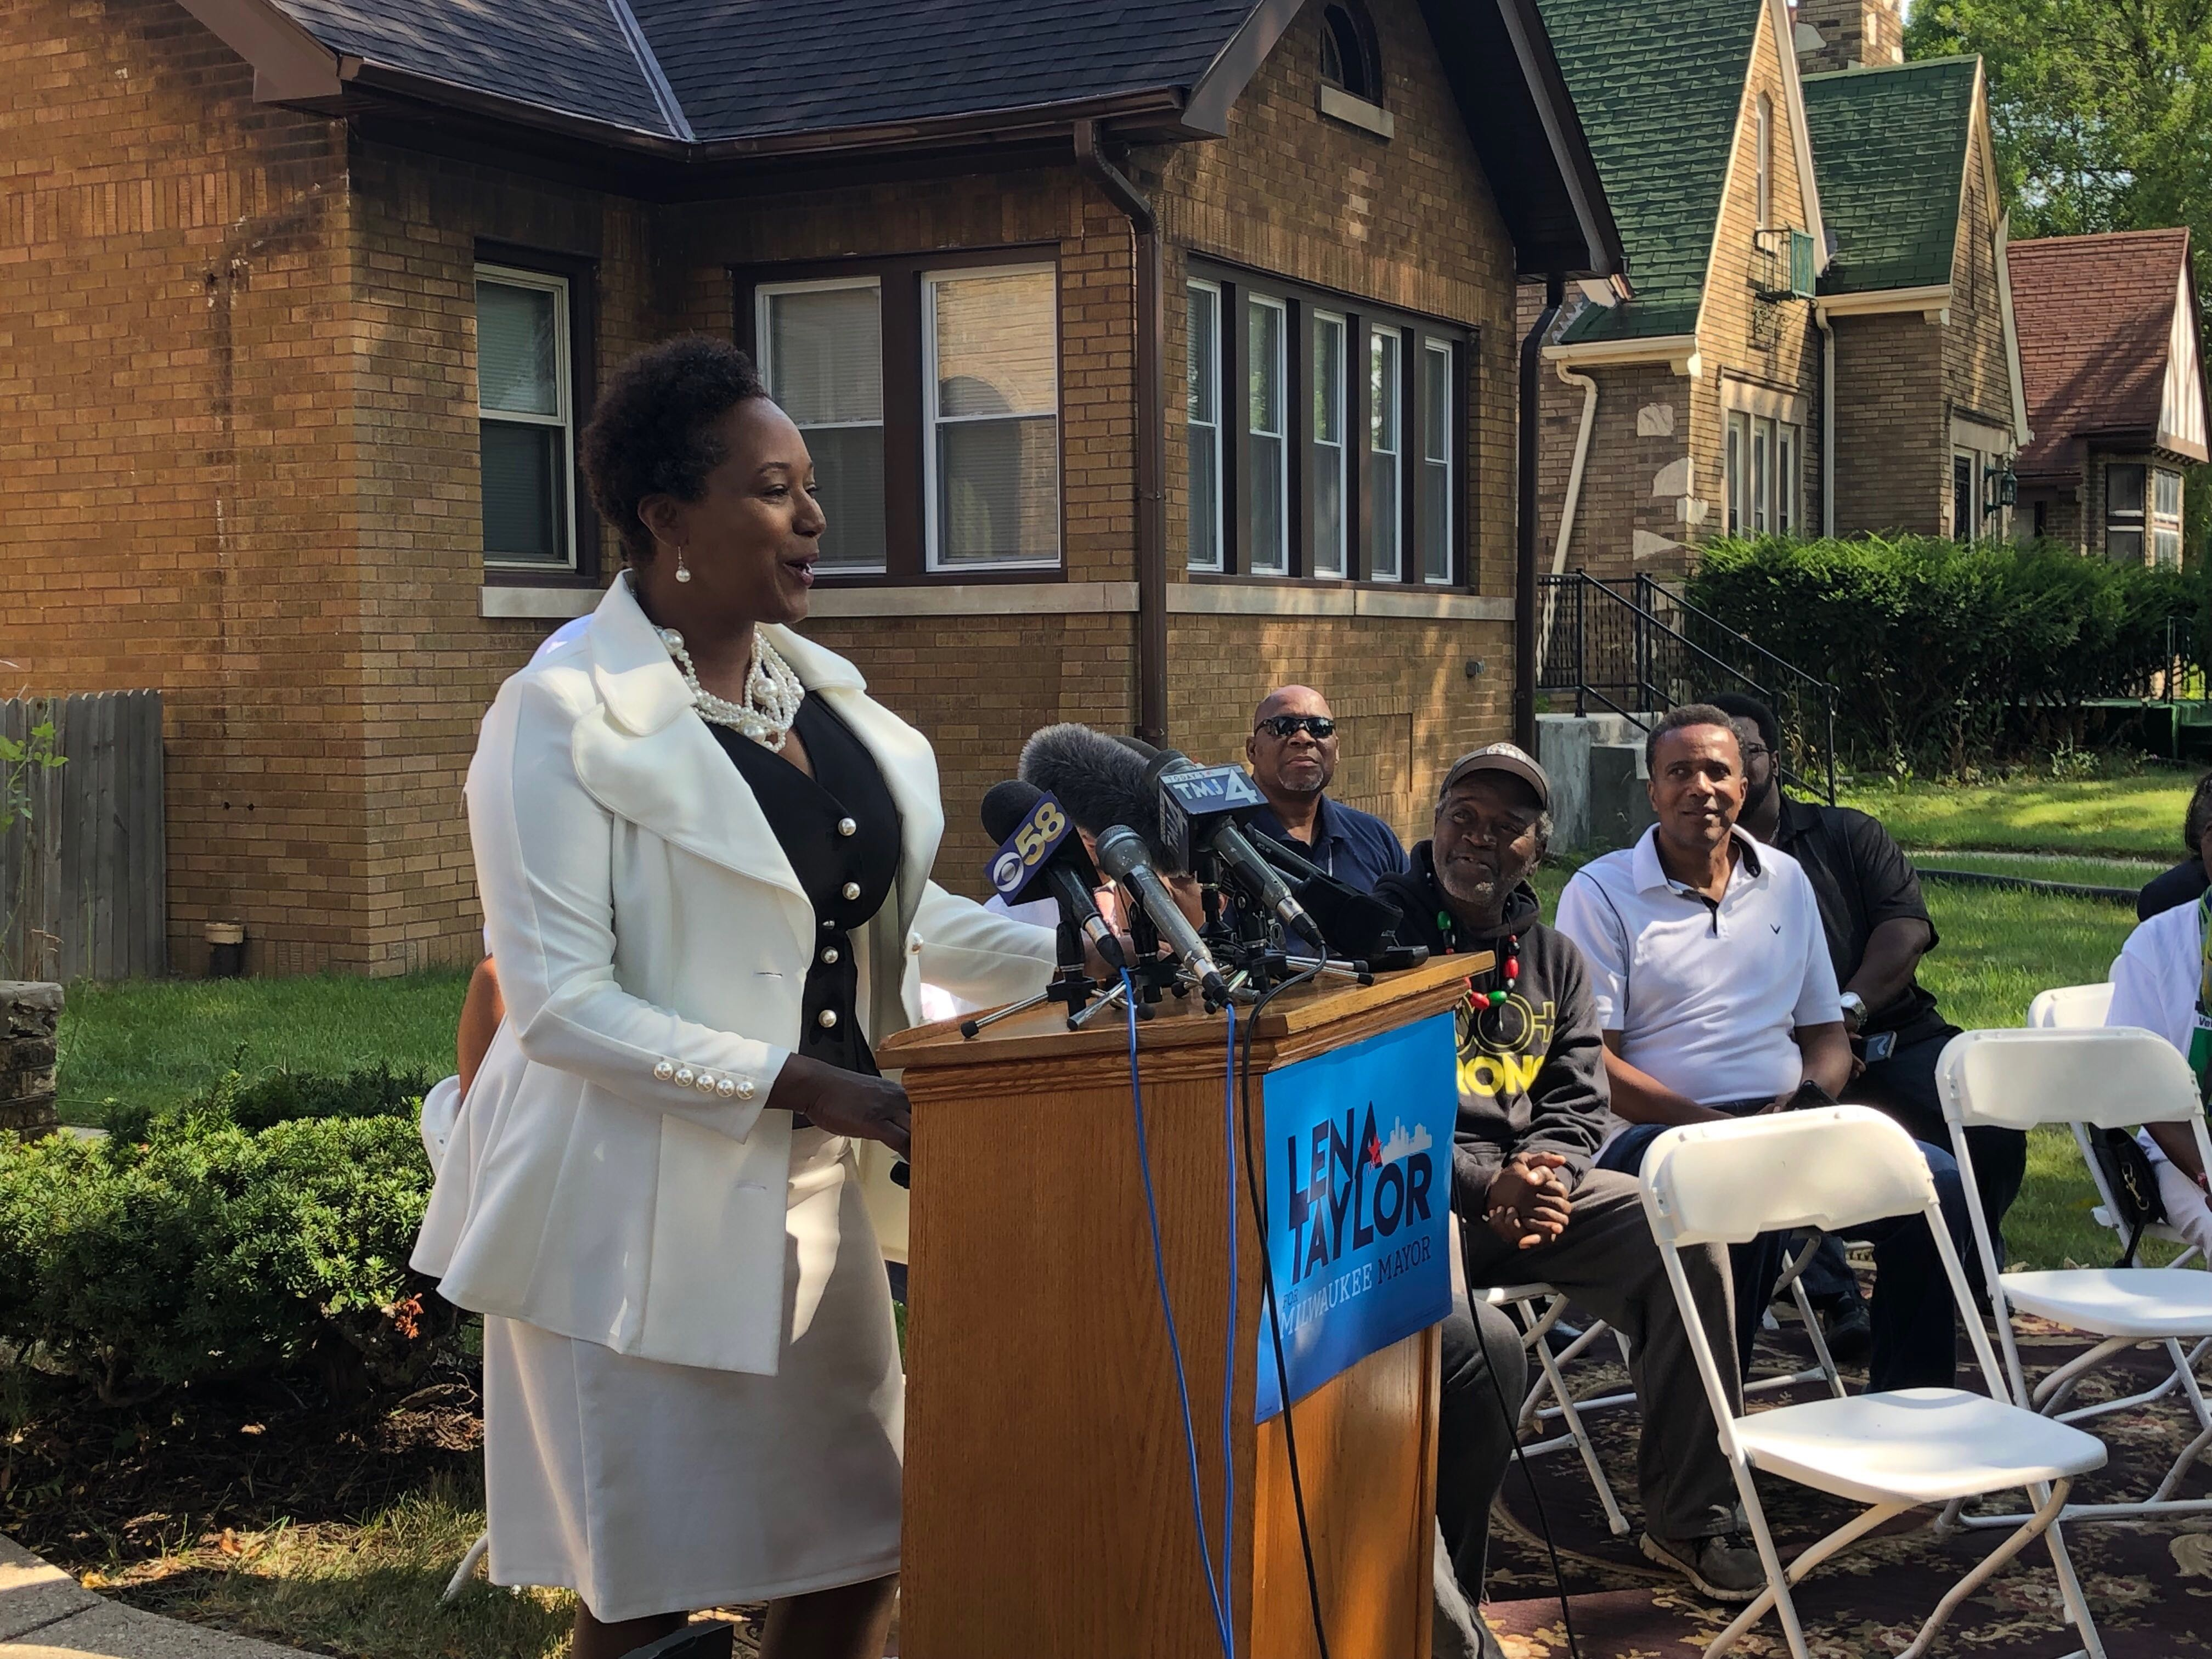 Senator Lena Taylor announces her run for Mayor. Photo by Jeramey Jannene.